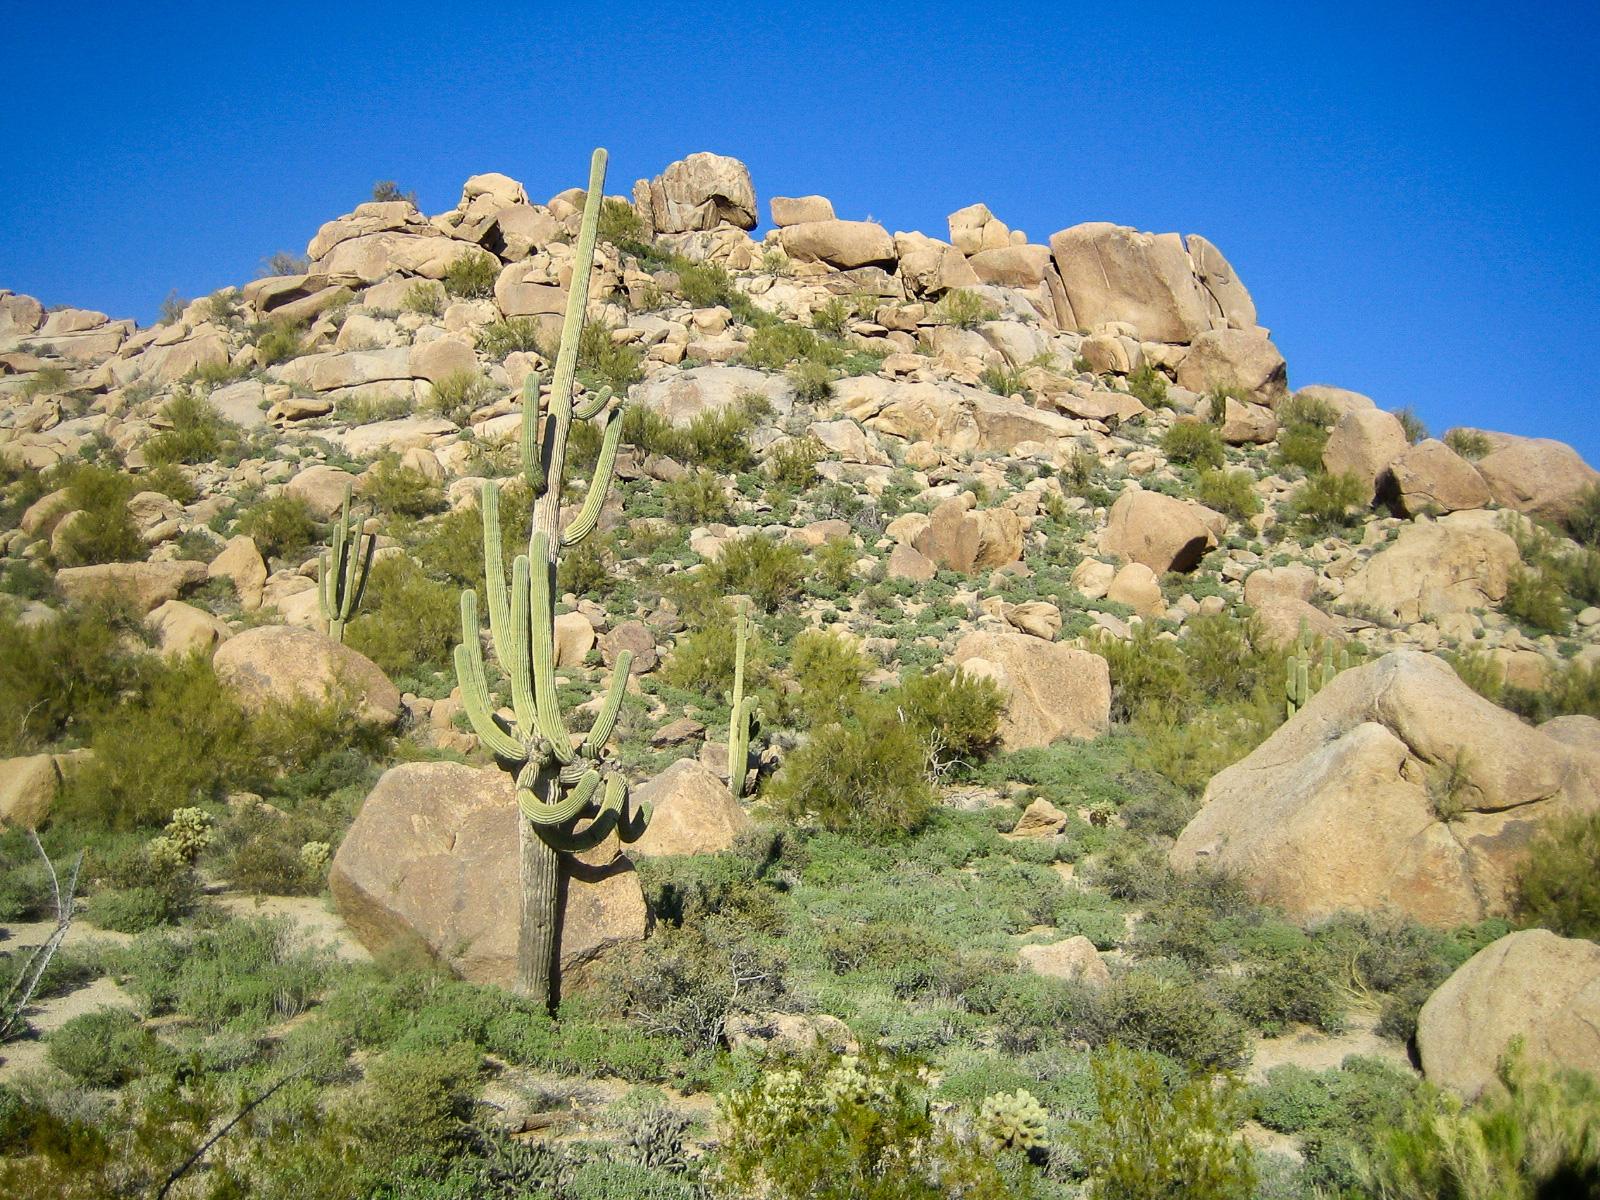 Orgelpfeifenkaktus in Scottsdale in Arizona